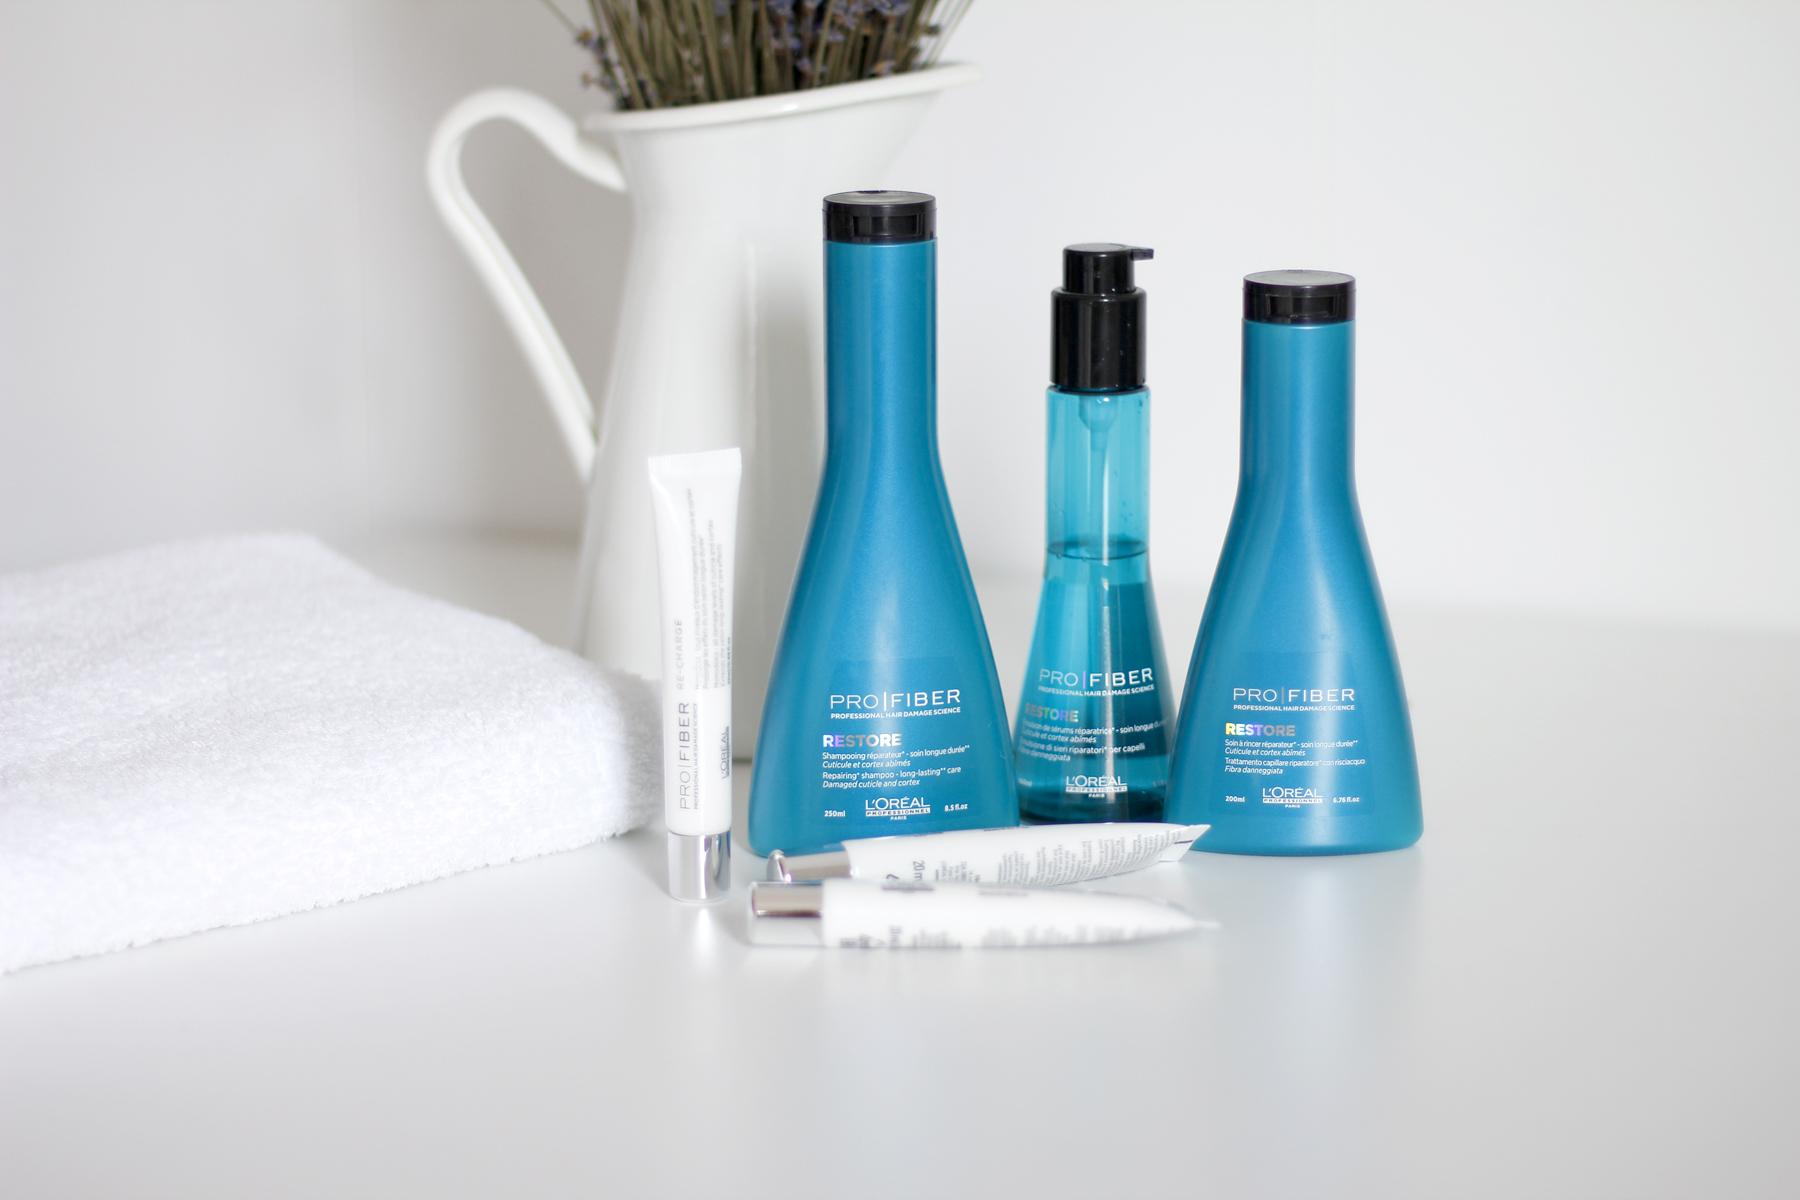 pro fiber l'oréal professionel hair treatment neue pflegerevolution beauty beautyblogger düsseldorf ricarda schernus blog cats & dogs berlin 1